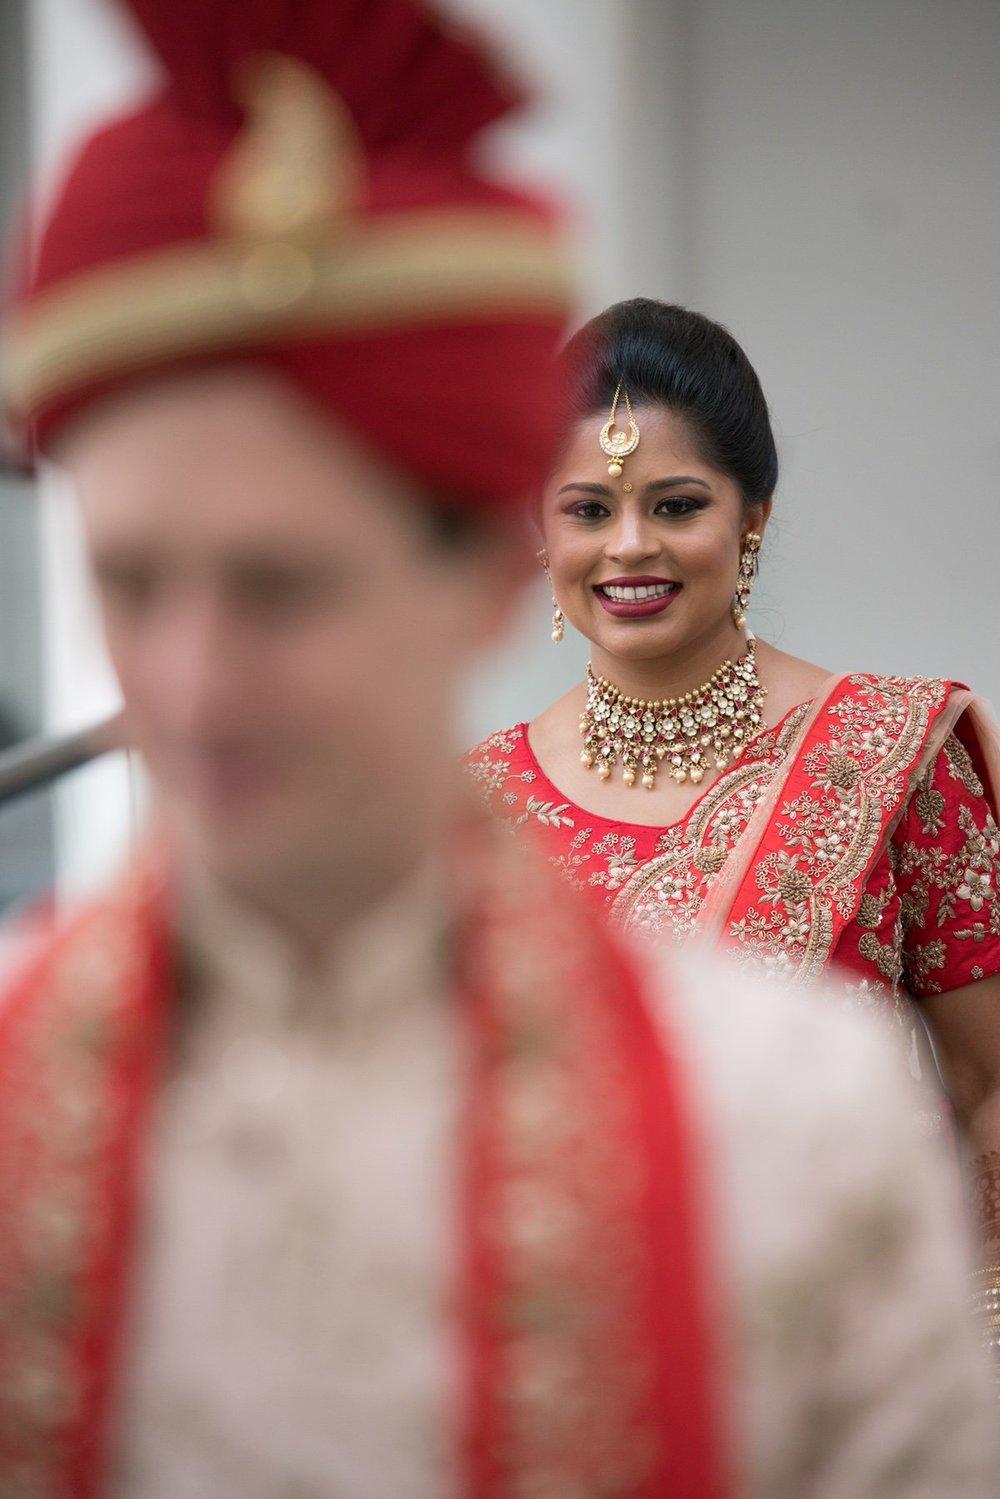 Le Cape Weddings - South Asian Wedding - Trisha and Jordan - First Look --20.jpg